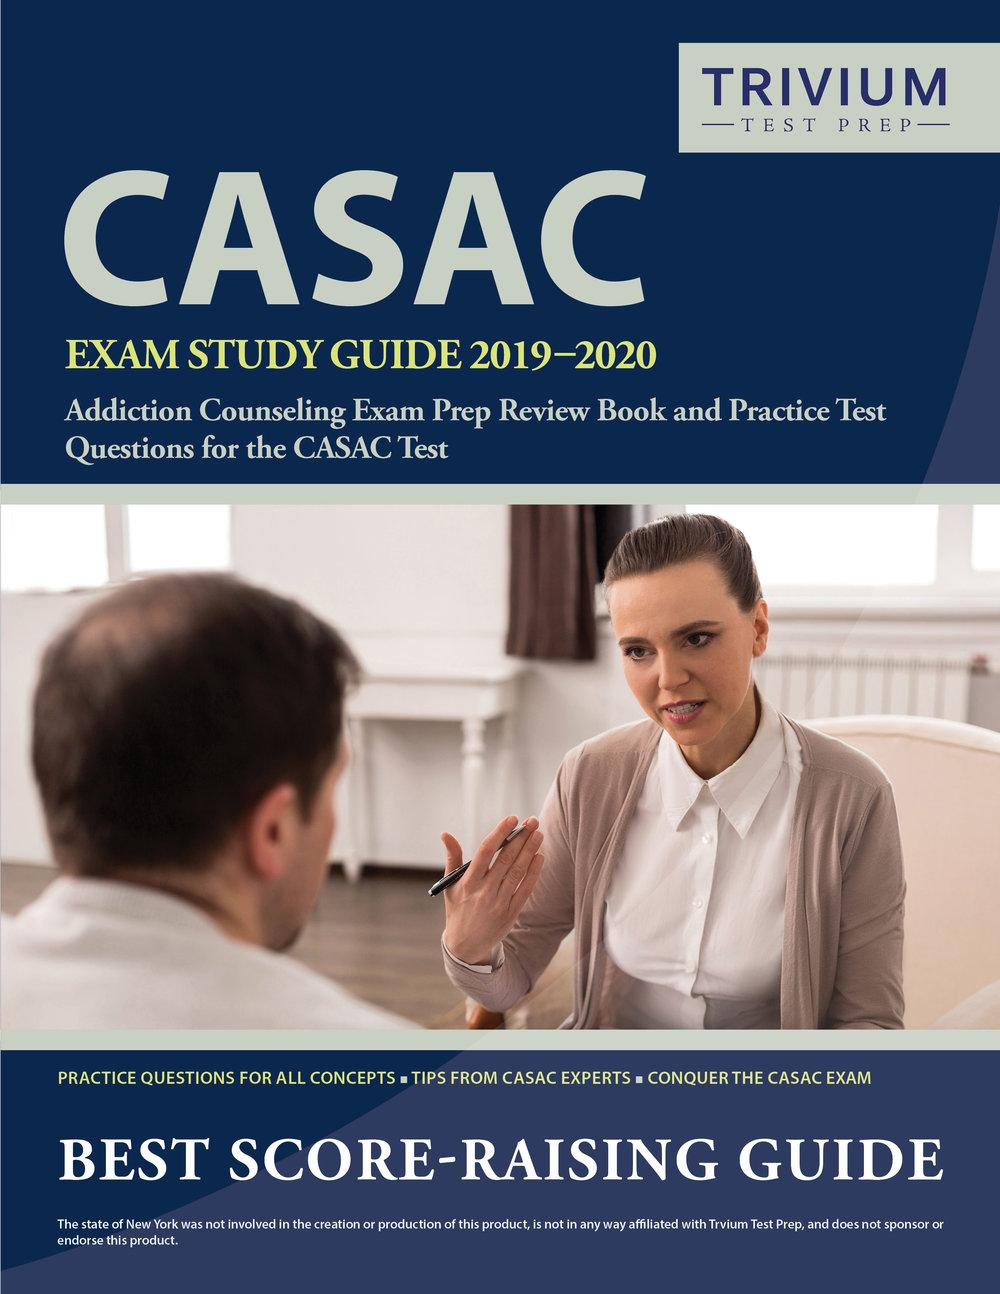 CASAC Study Guide 2019-2020